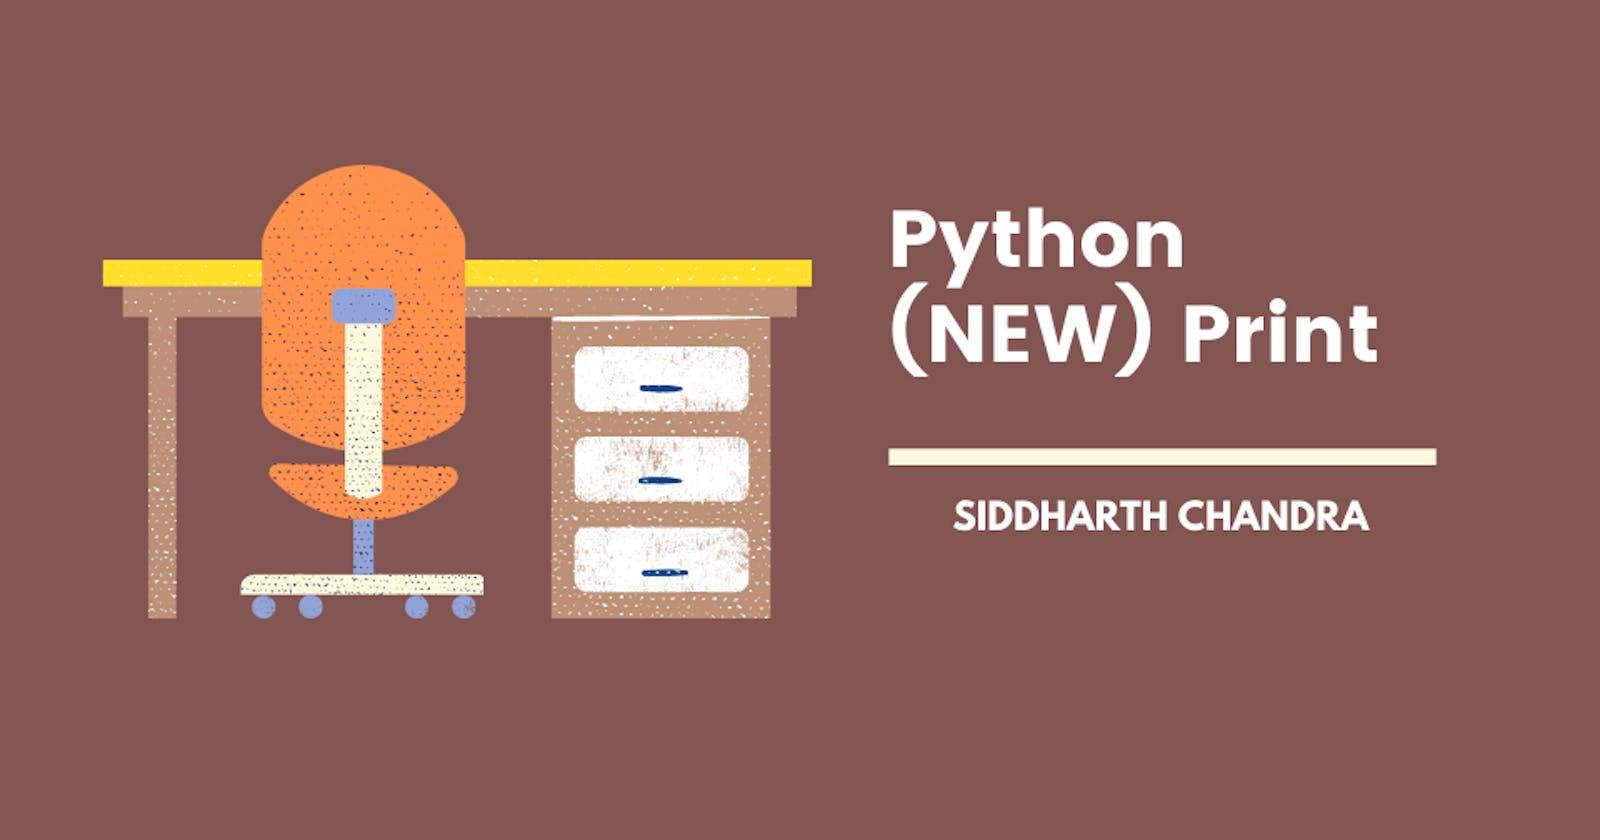 Python (NEW) Print ?